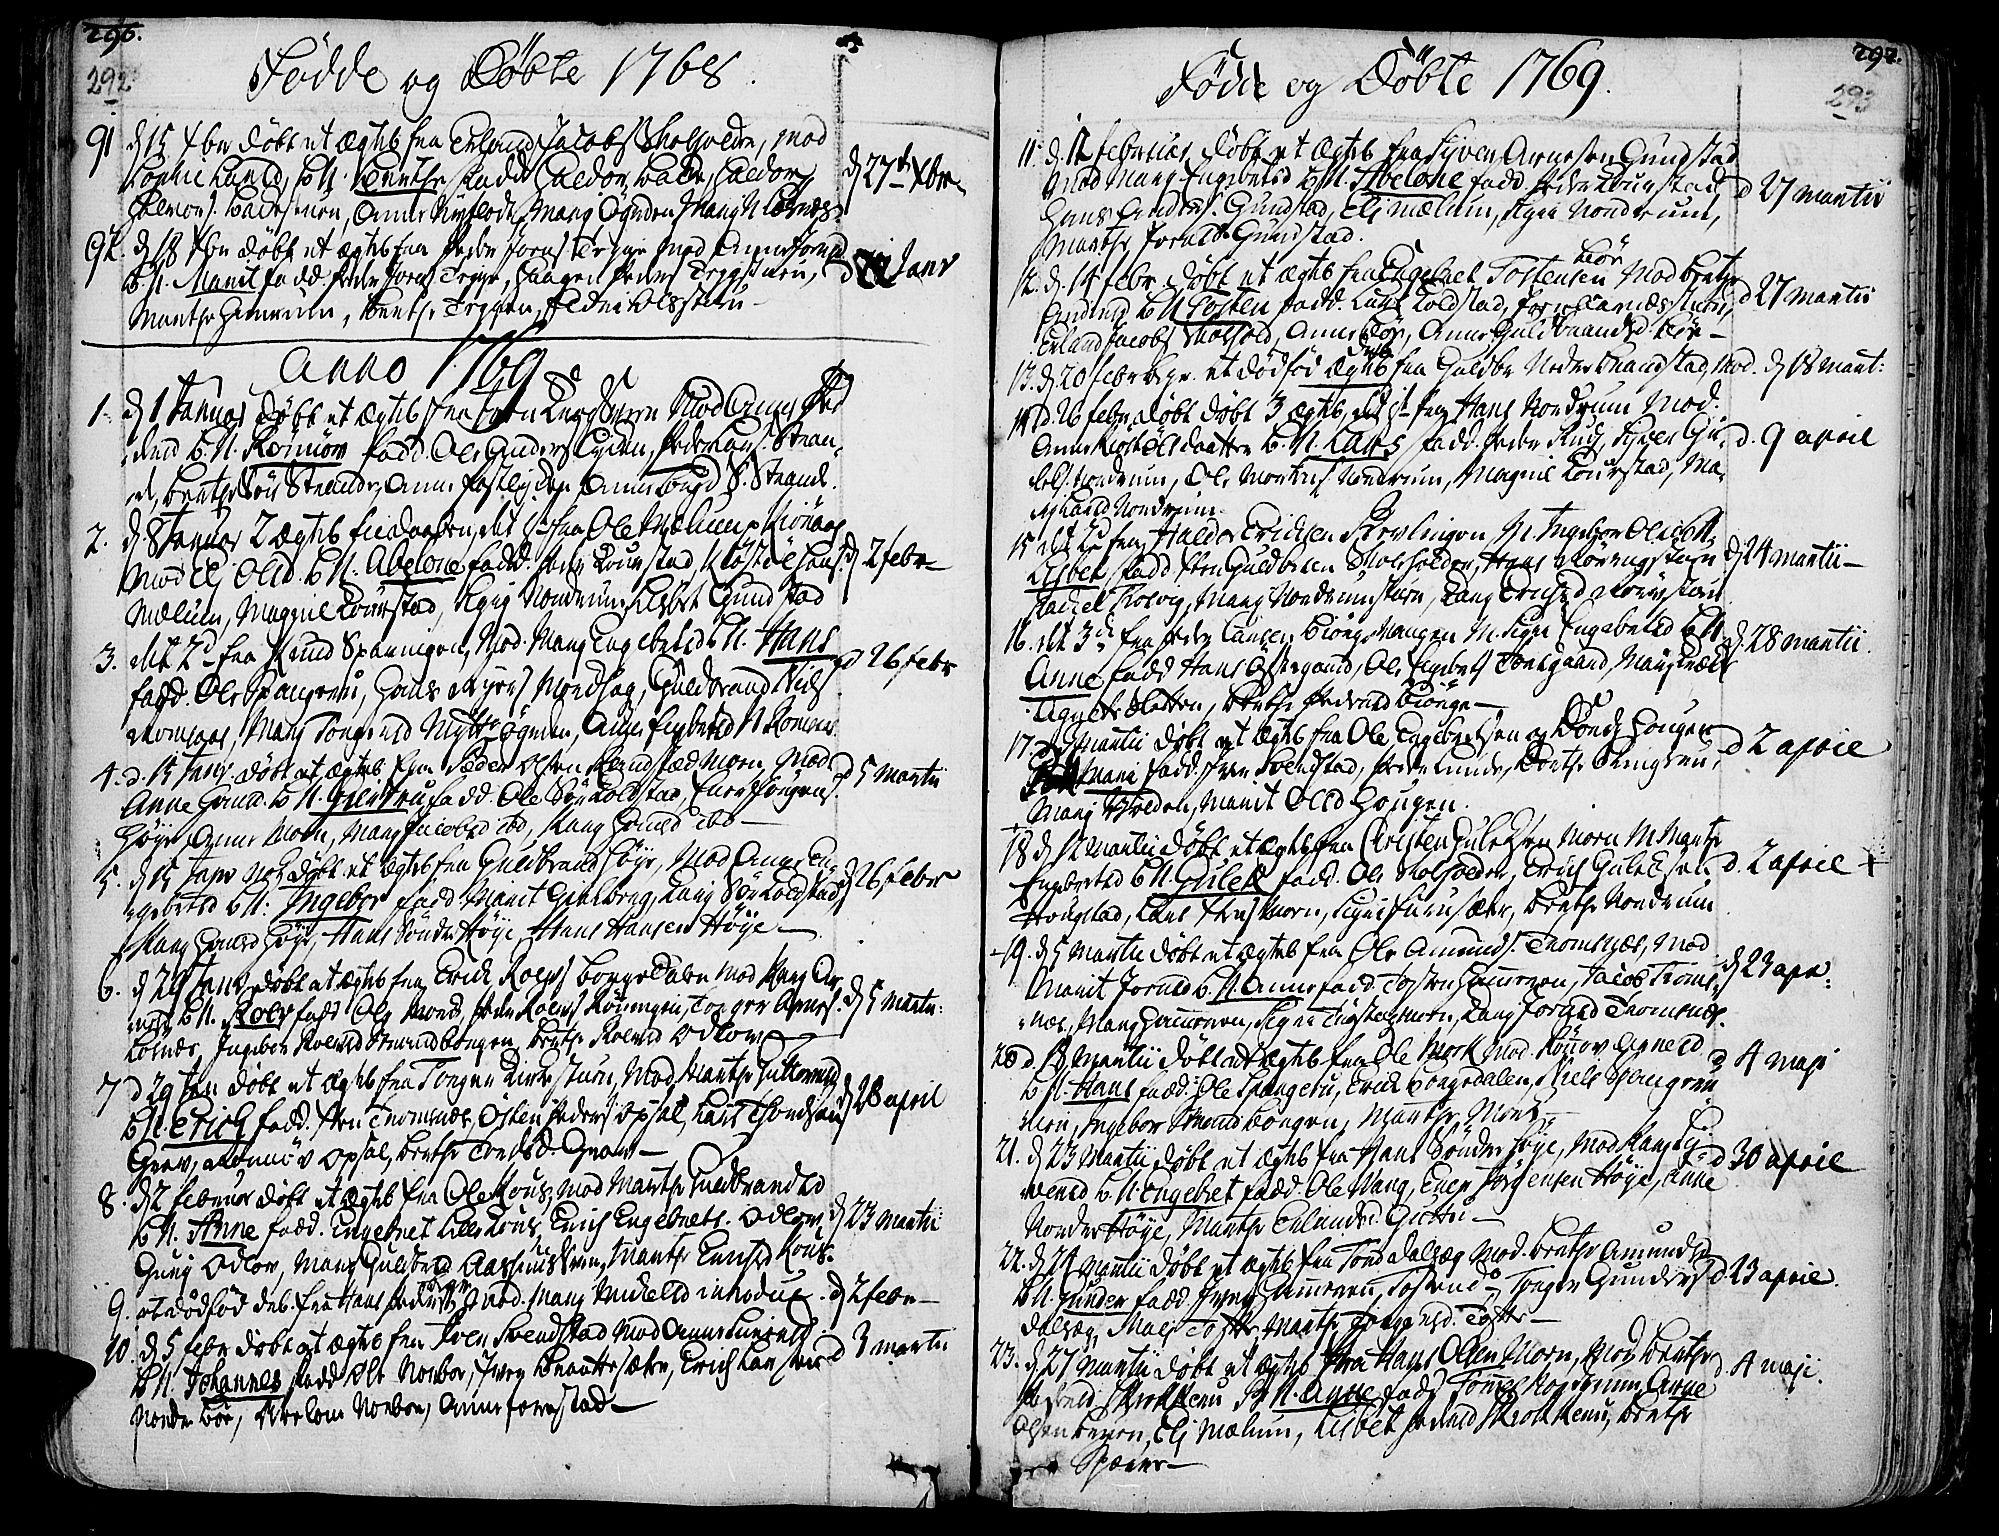 SAH, Ringebu prestekontor, Ministerialbok nr. 2, 1734-1780, s. 292-293